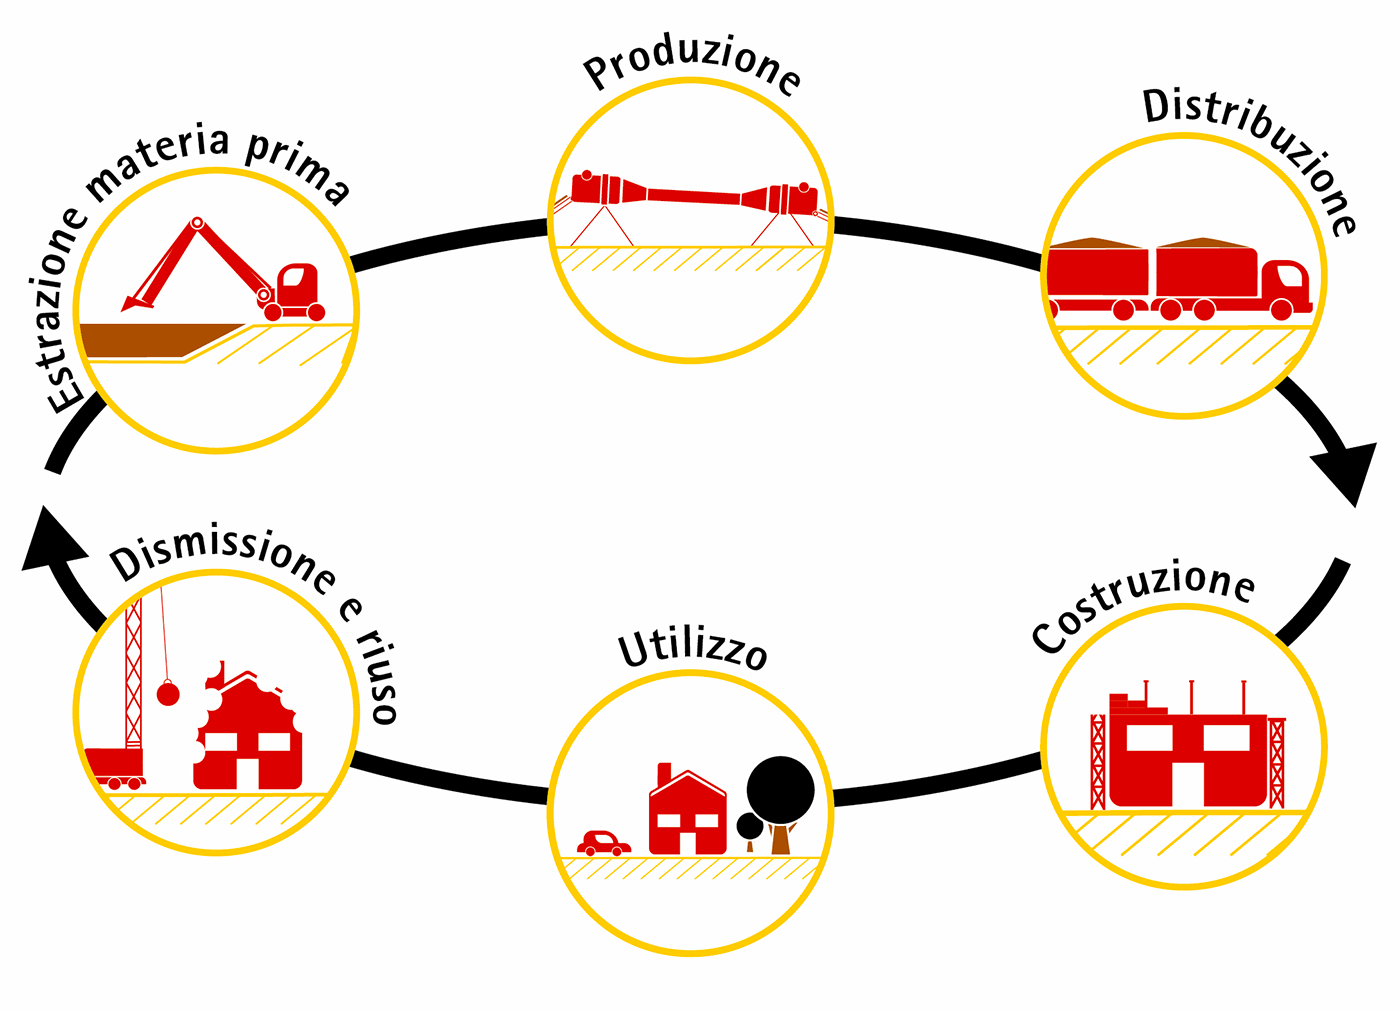 ciclo-di-vita-produzione-leca